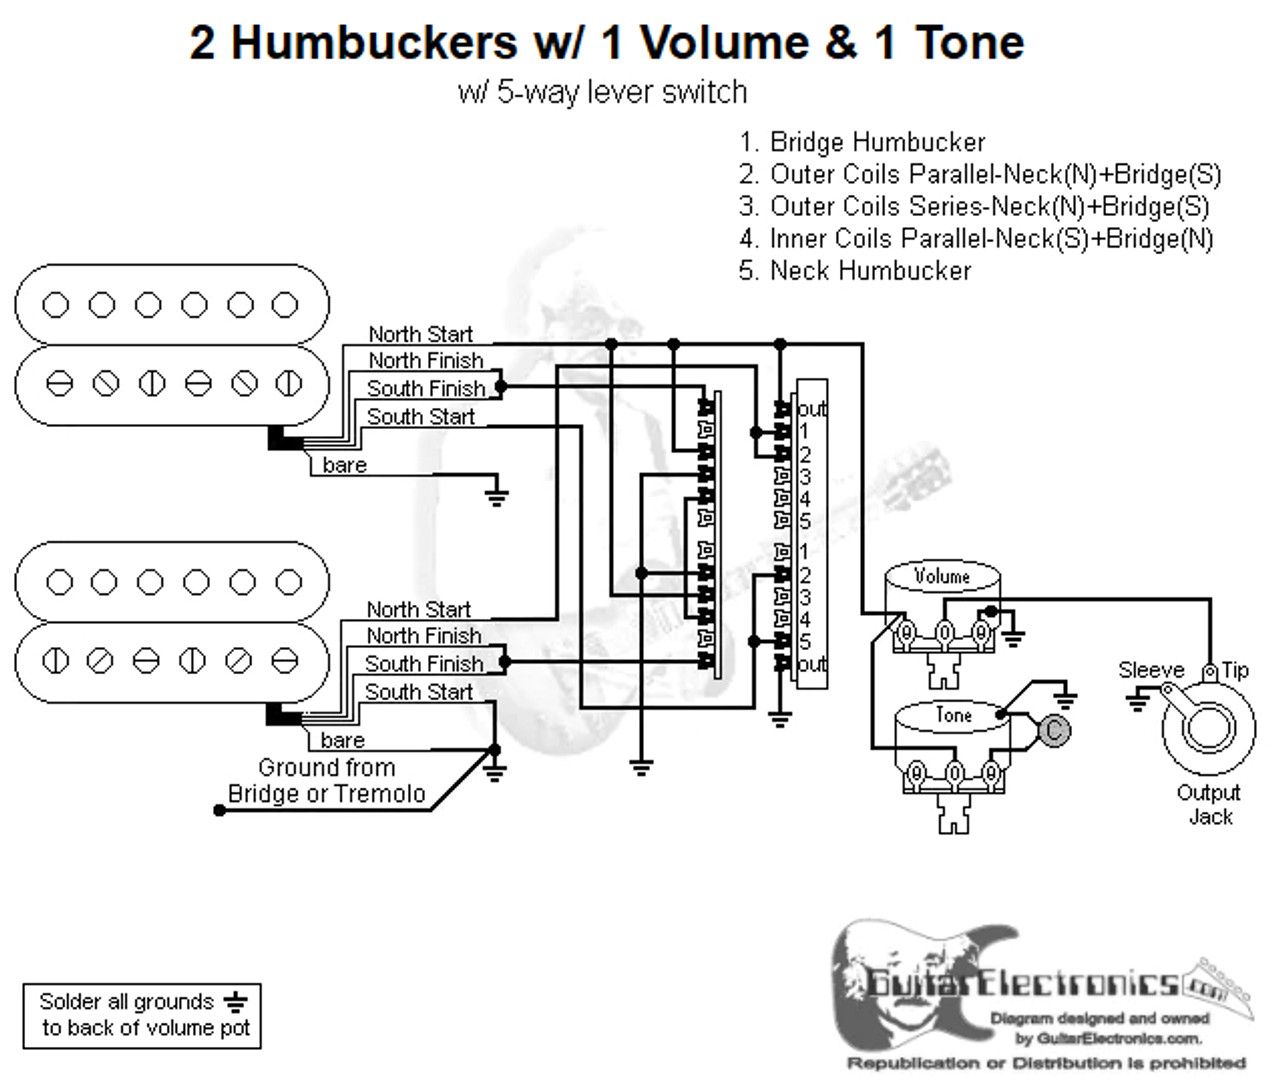 wiring diagram 5 way switch i 39m wiring diagram guitar 5-way switch wiring diagram 5 way switch i 39m #2